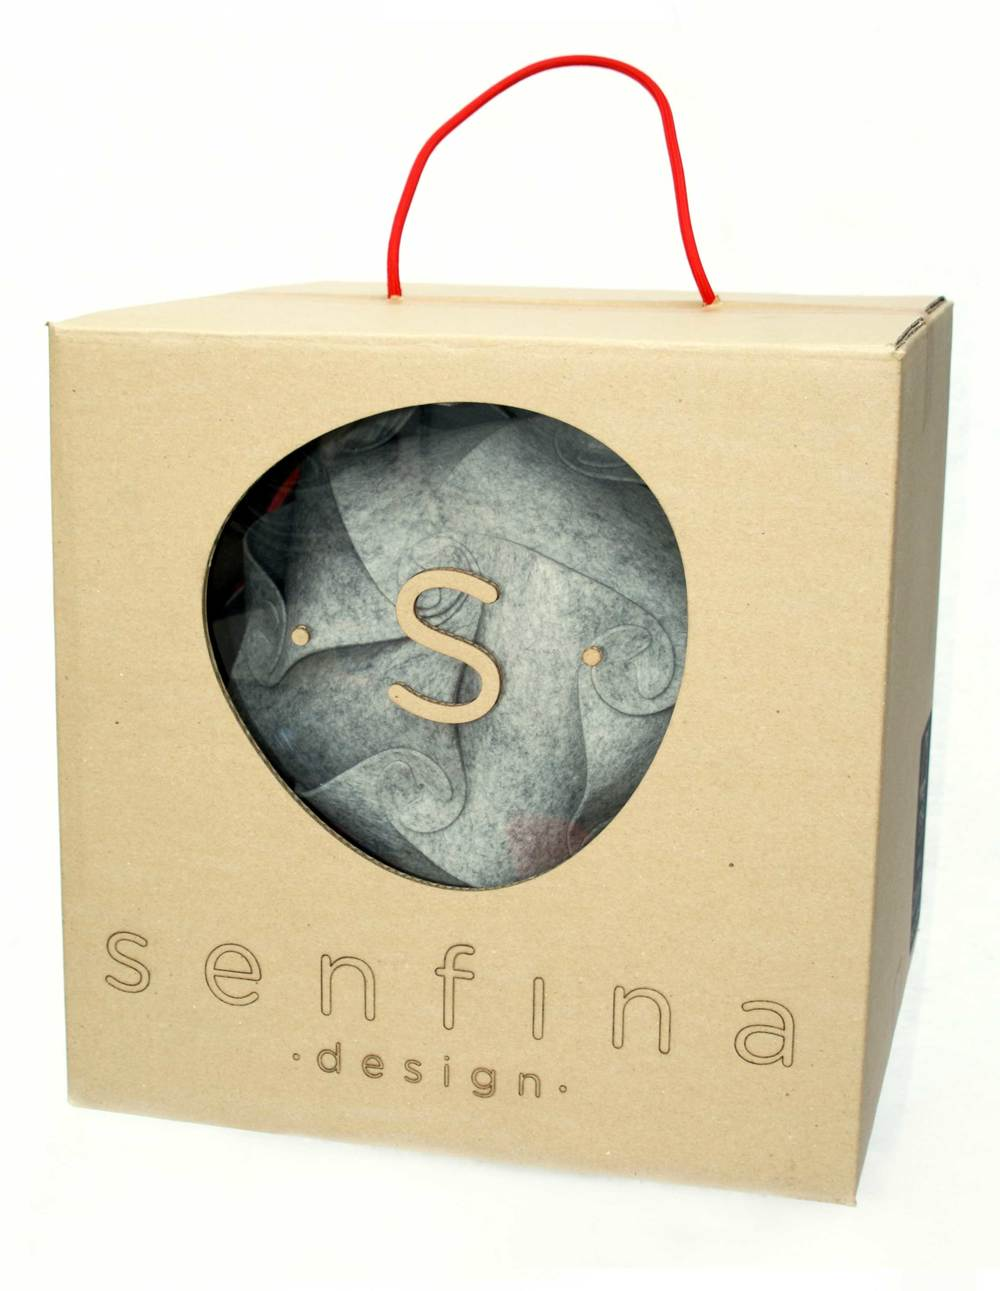 Verpakking Senfina lamp